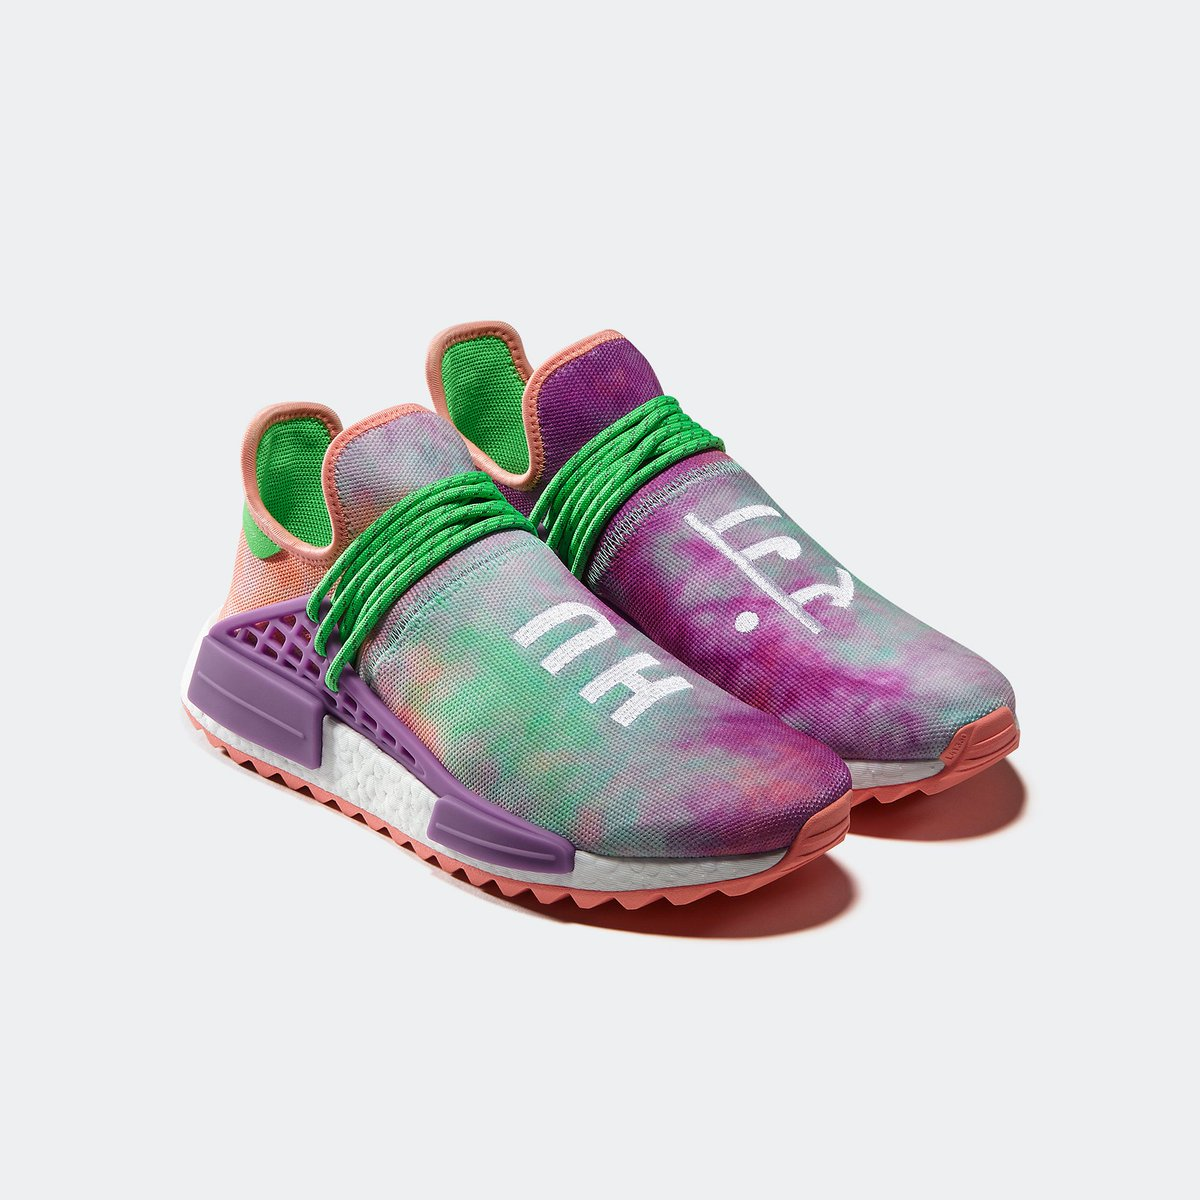 Sneakersnstuff on Twitter